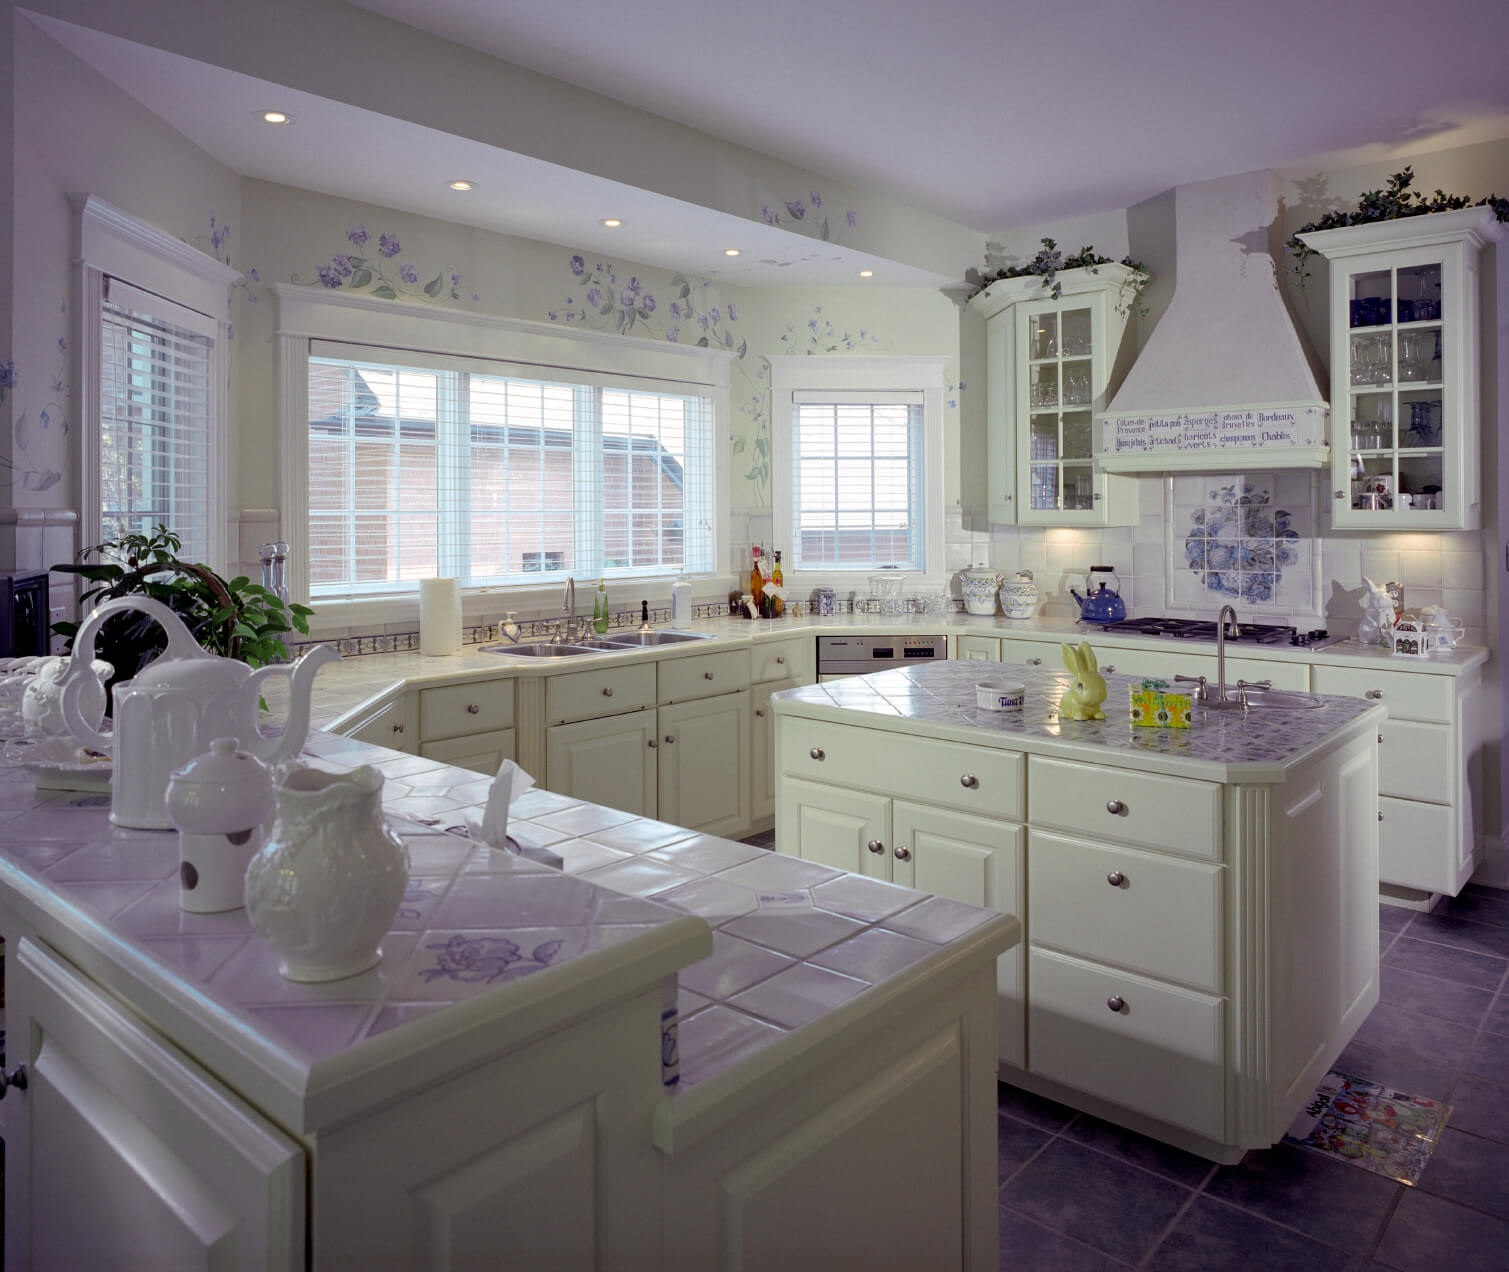 purple color kitchen floor image